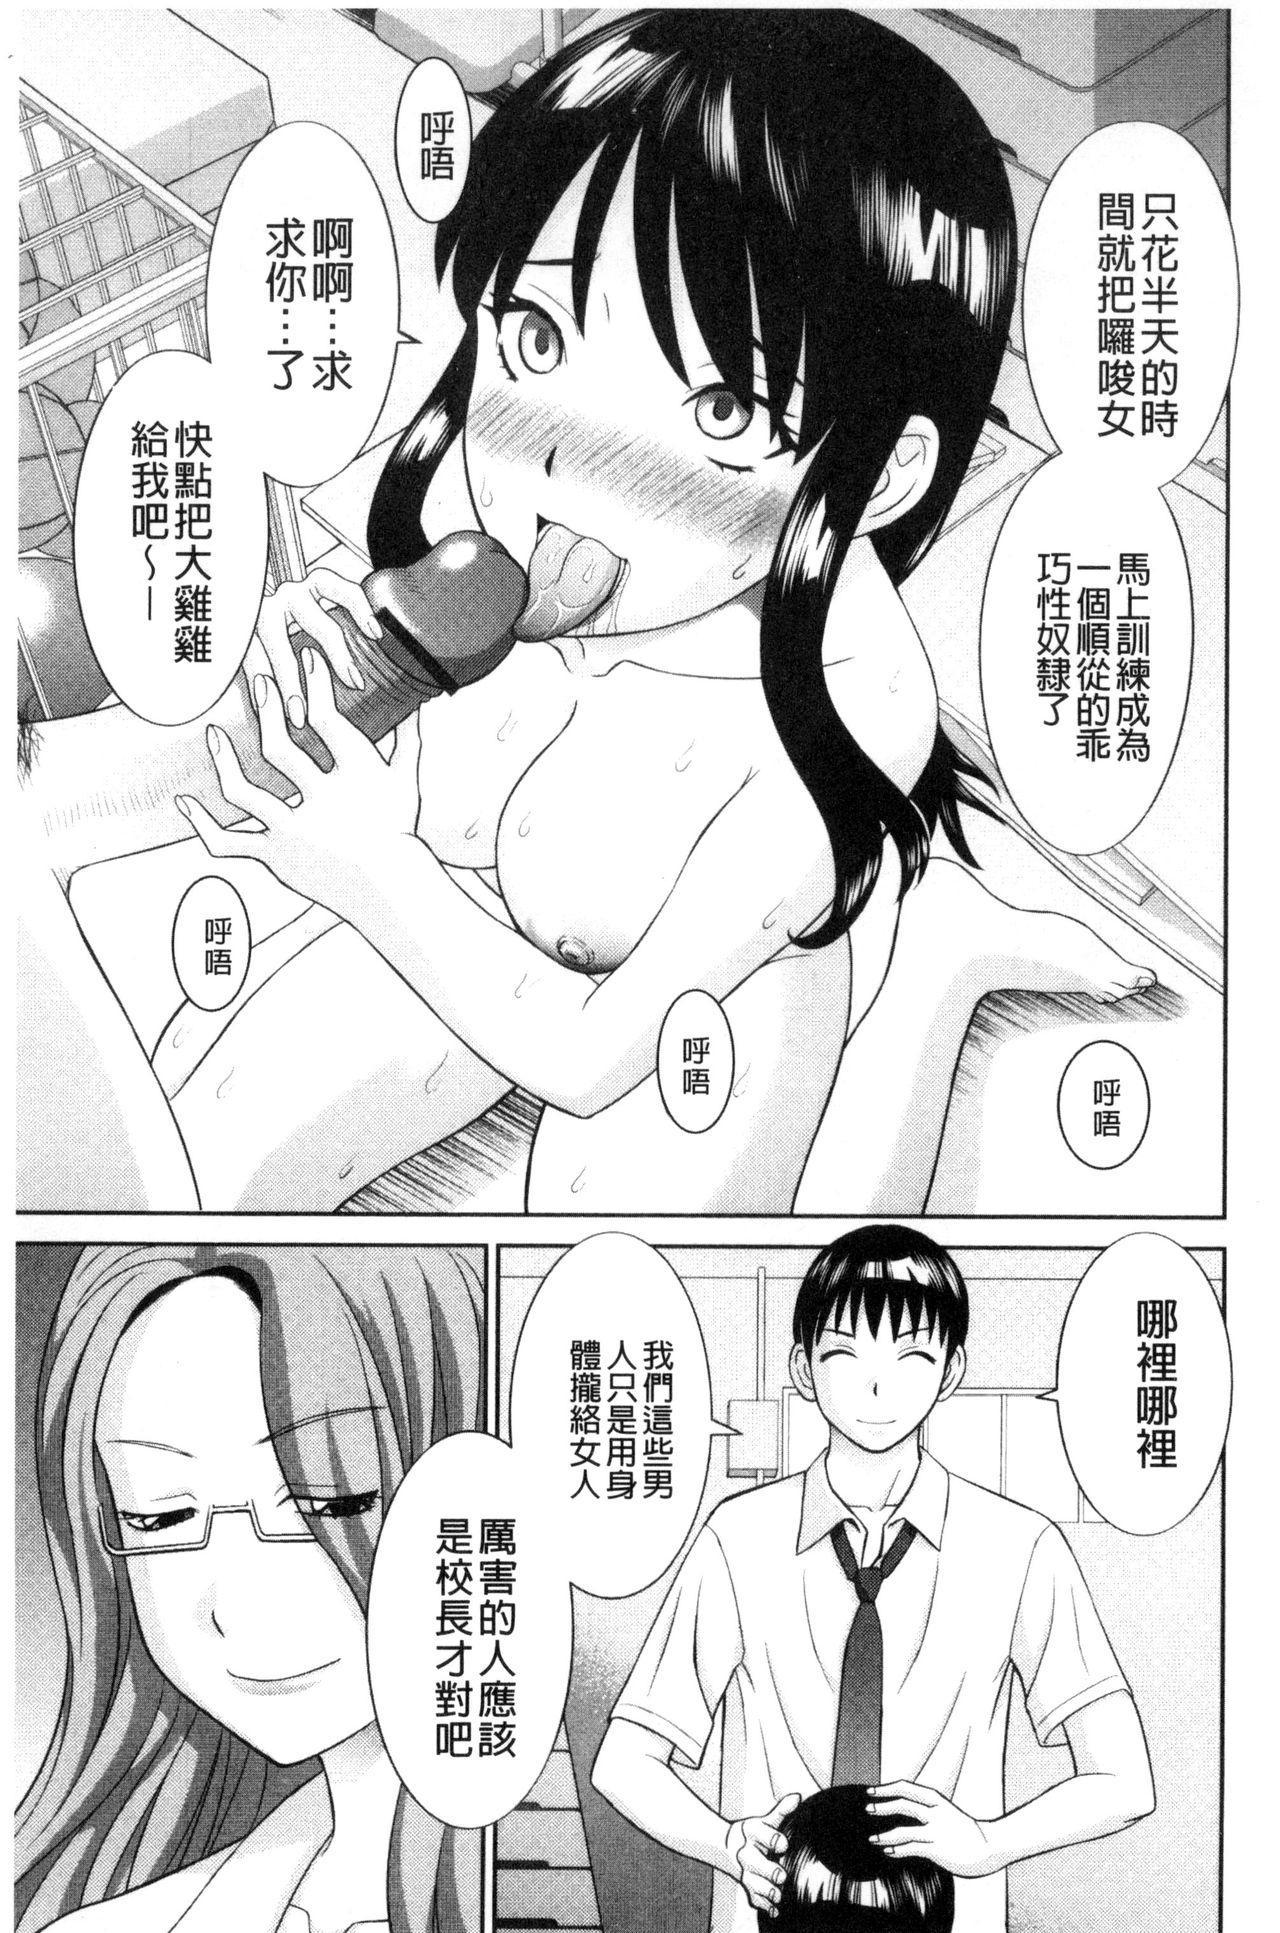 Haramase! Hitozuma Choukyoushi | 受孕吧!人妻調教師 114